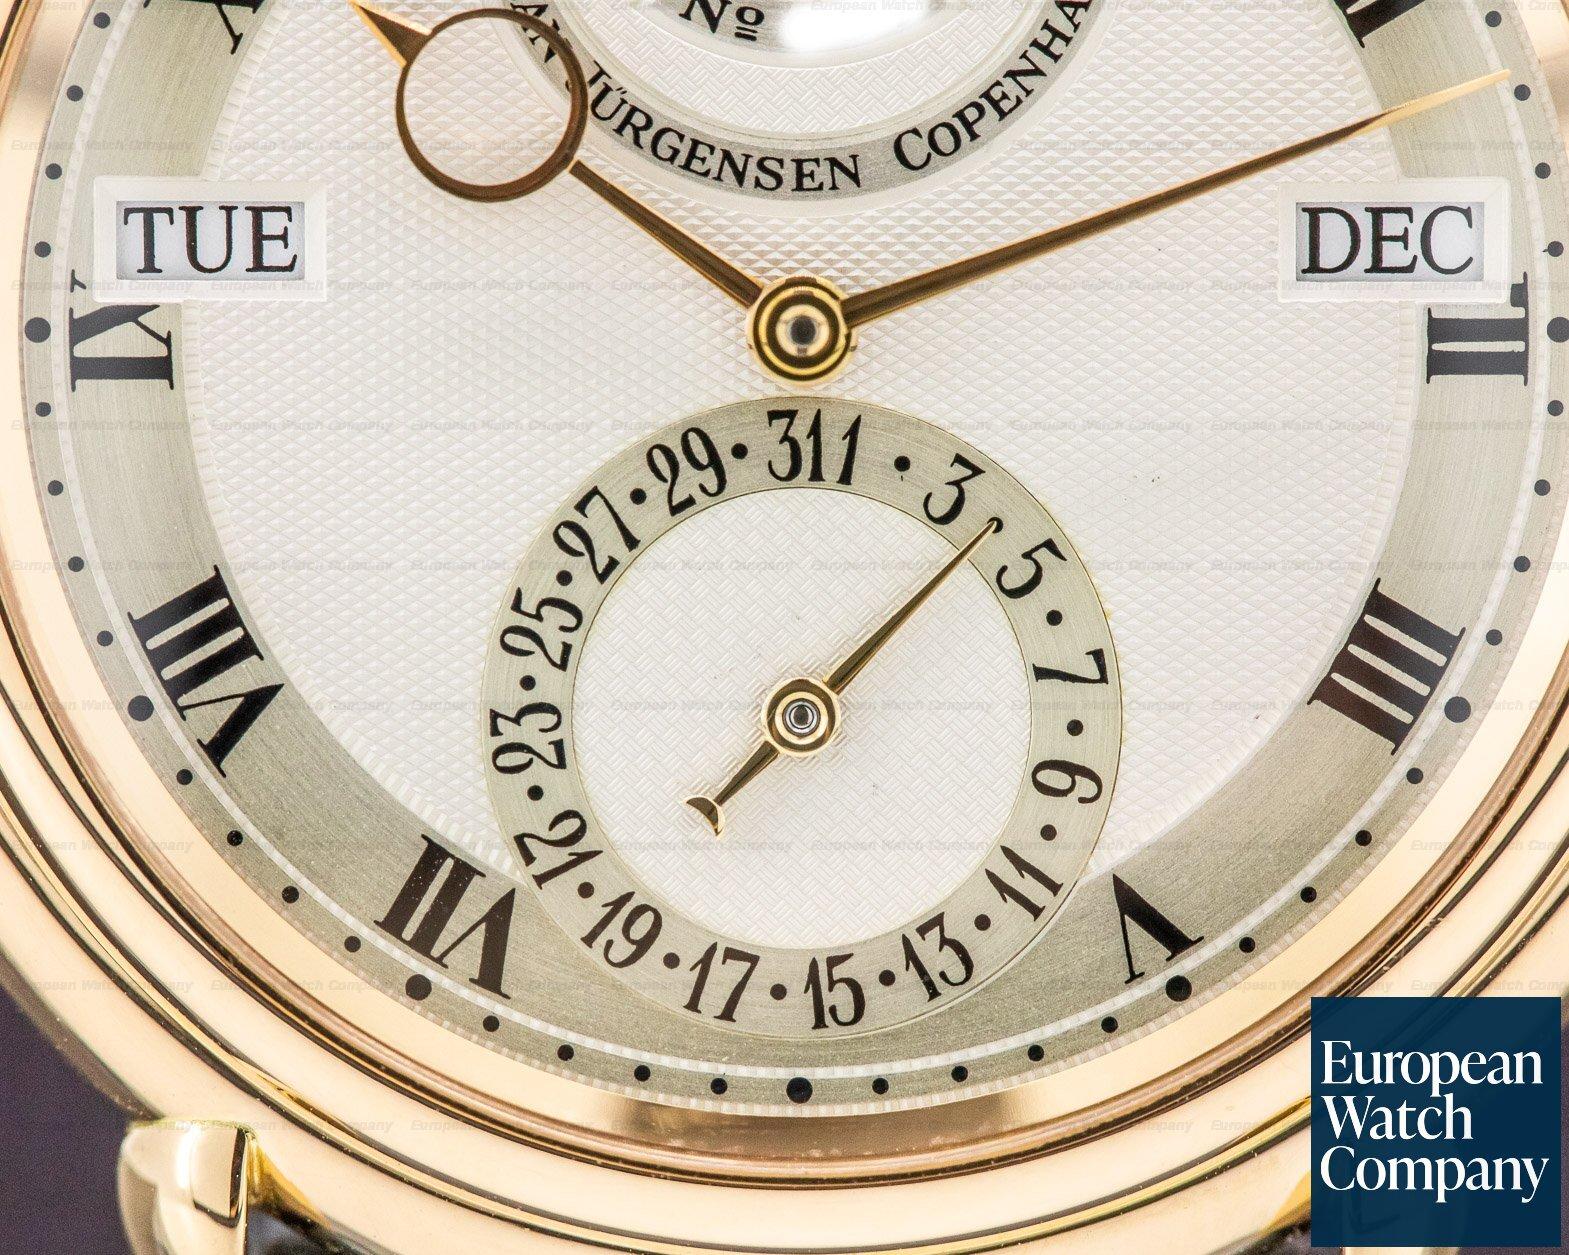 Urban Jurgensen Reference 2 Reference 2 Perpetual Calendar 18k Rose Gold LIMITED